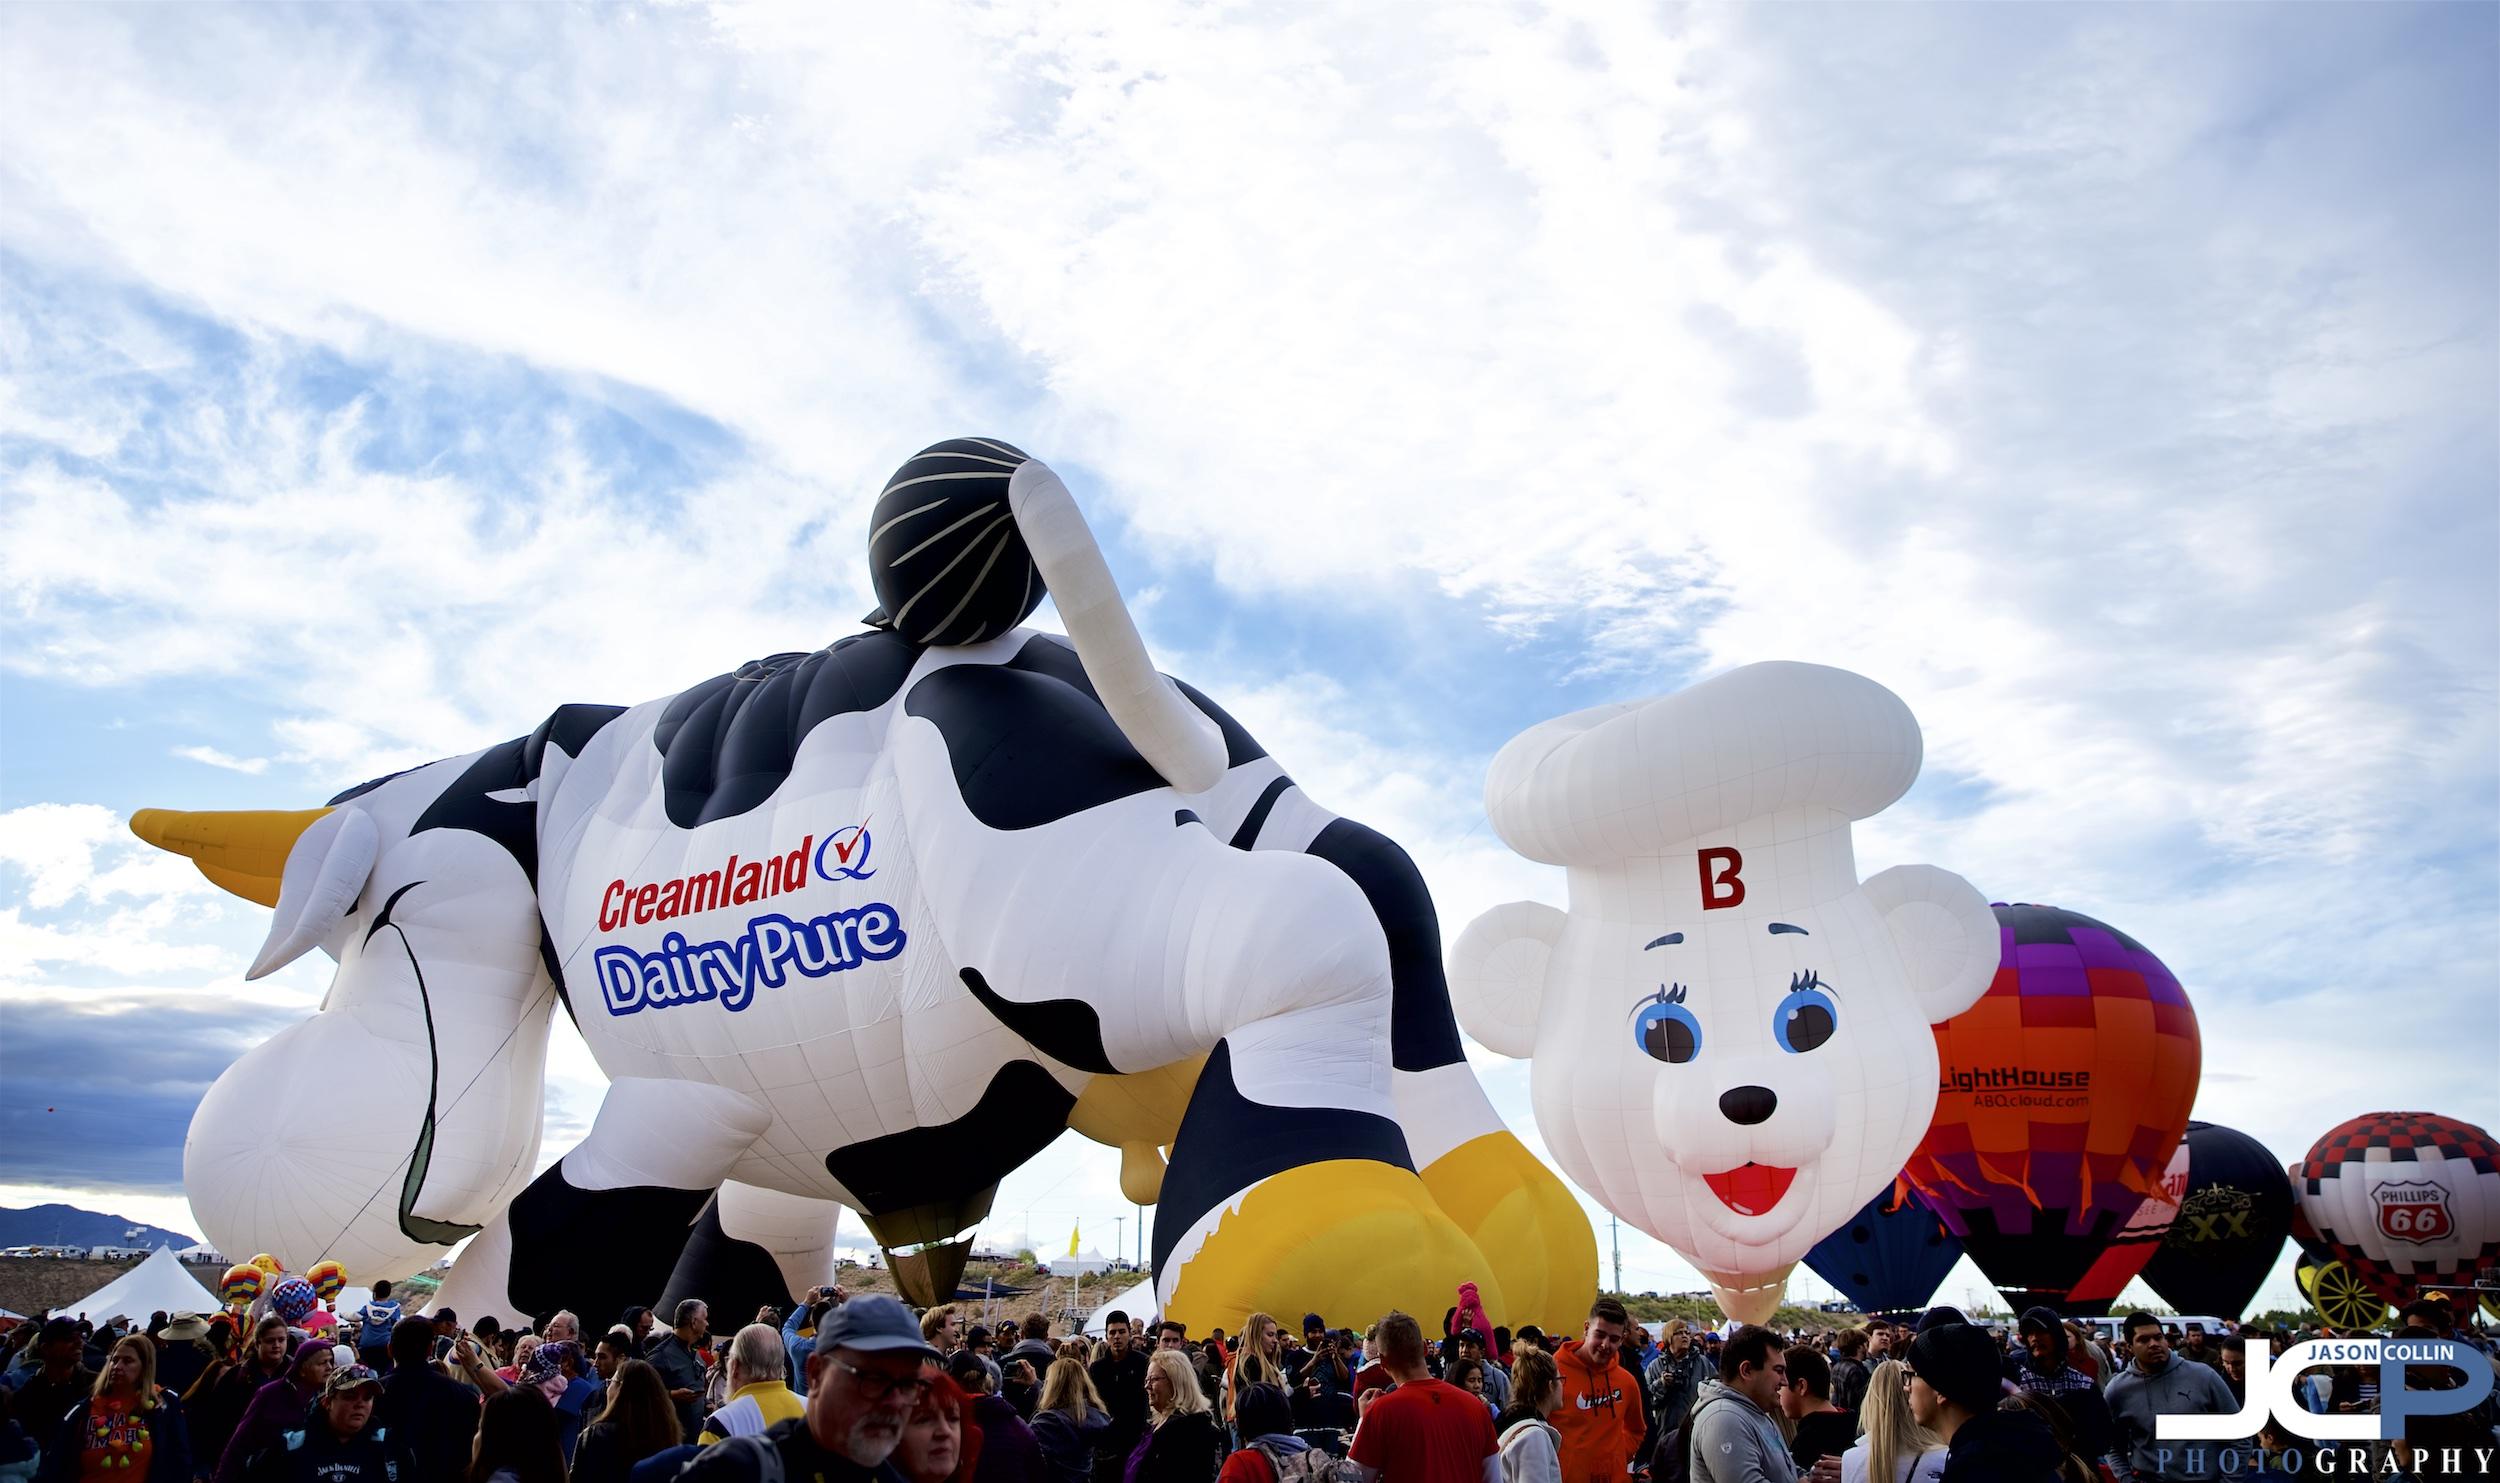 balloon-fiesta-2018-abq-108299.jpg